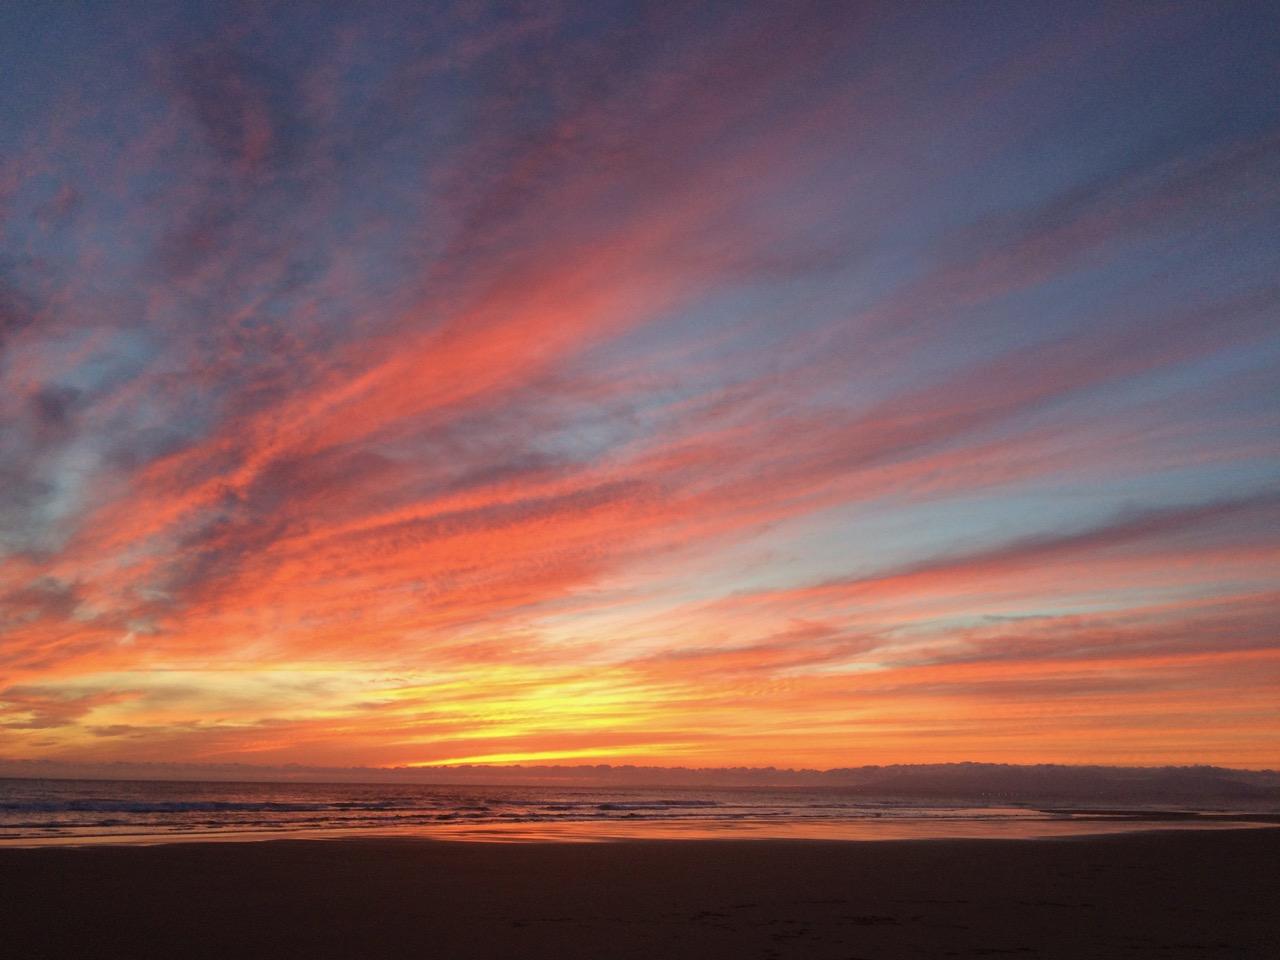 Dramatic sunset on Costa da Caparica, Portugal